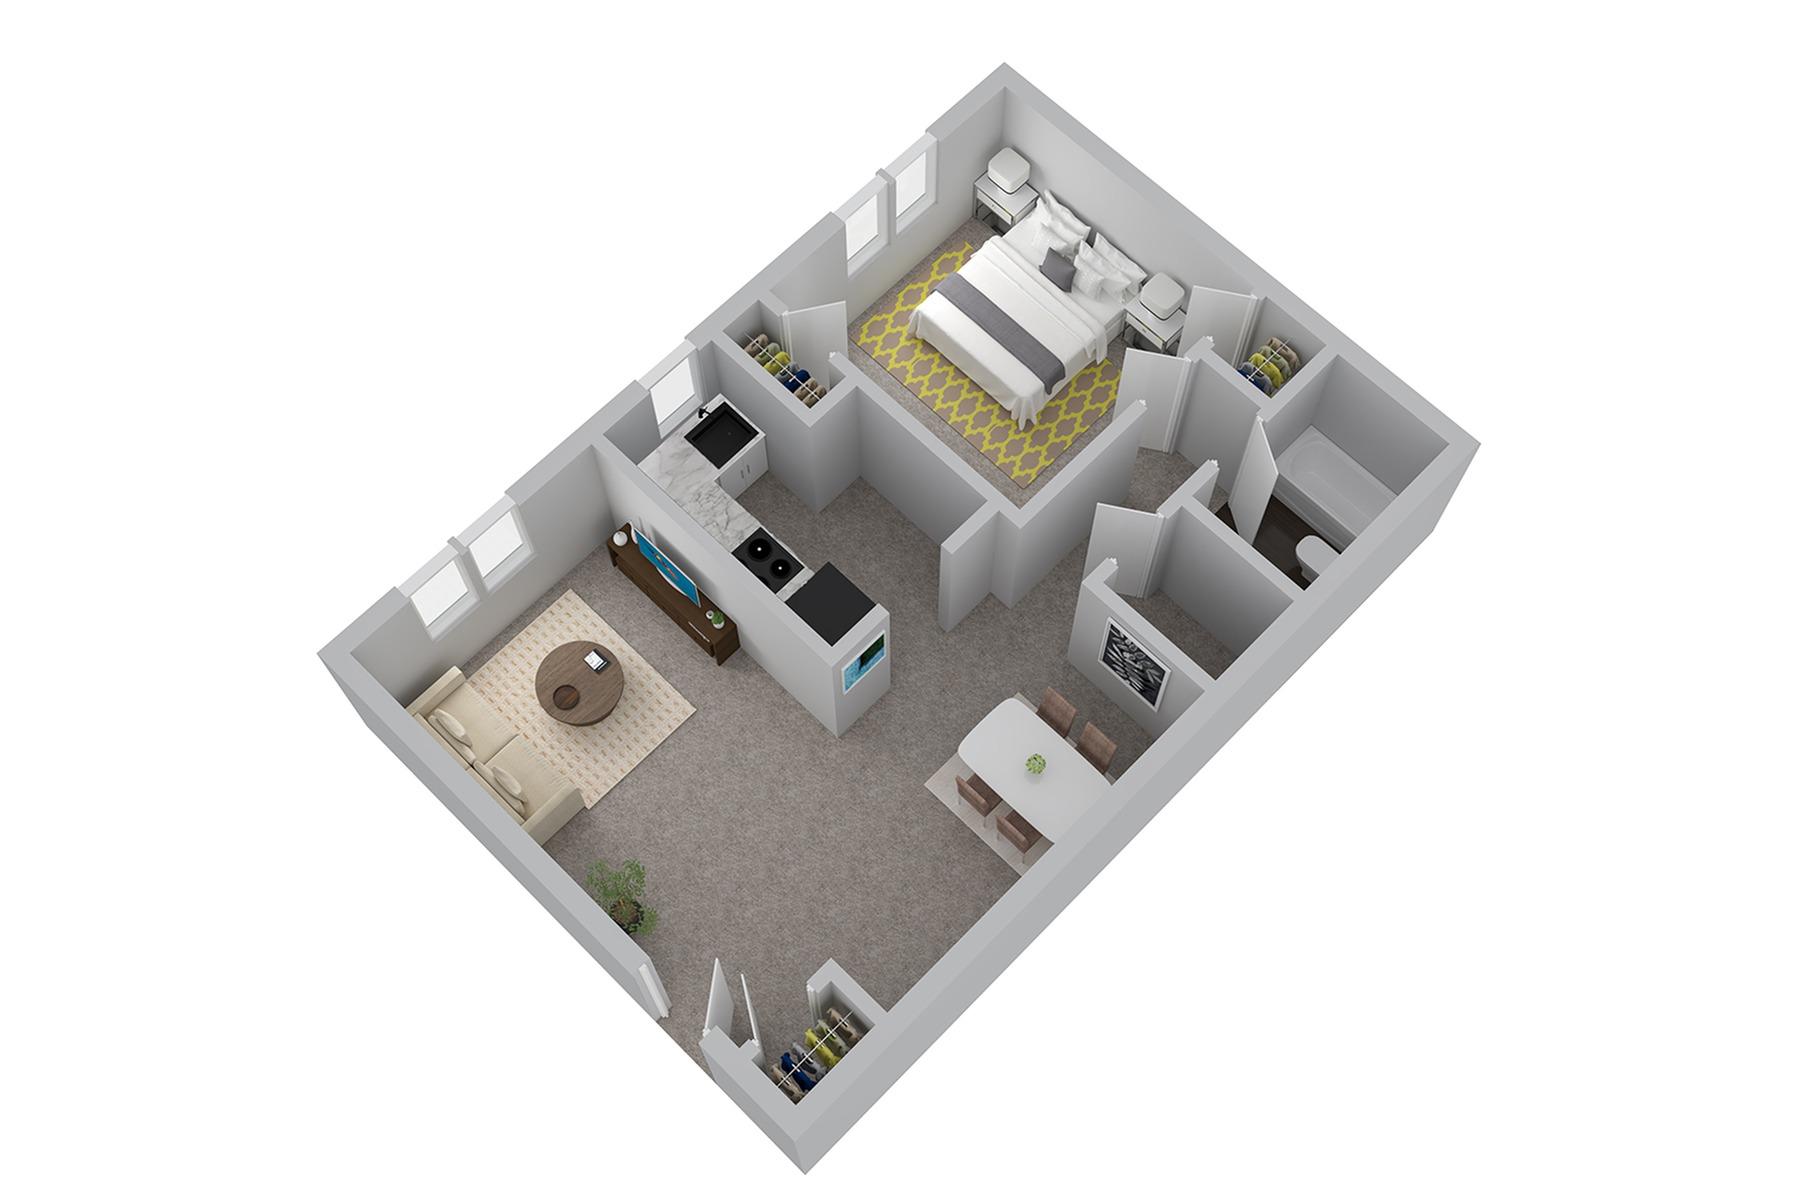 A1R2 1 Bedroom 1 Bathroom